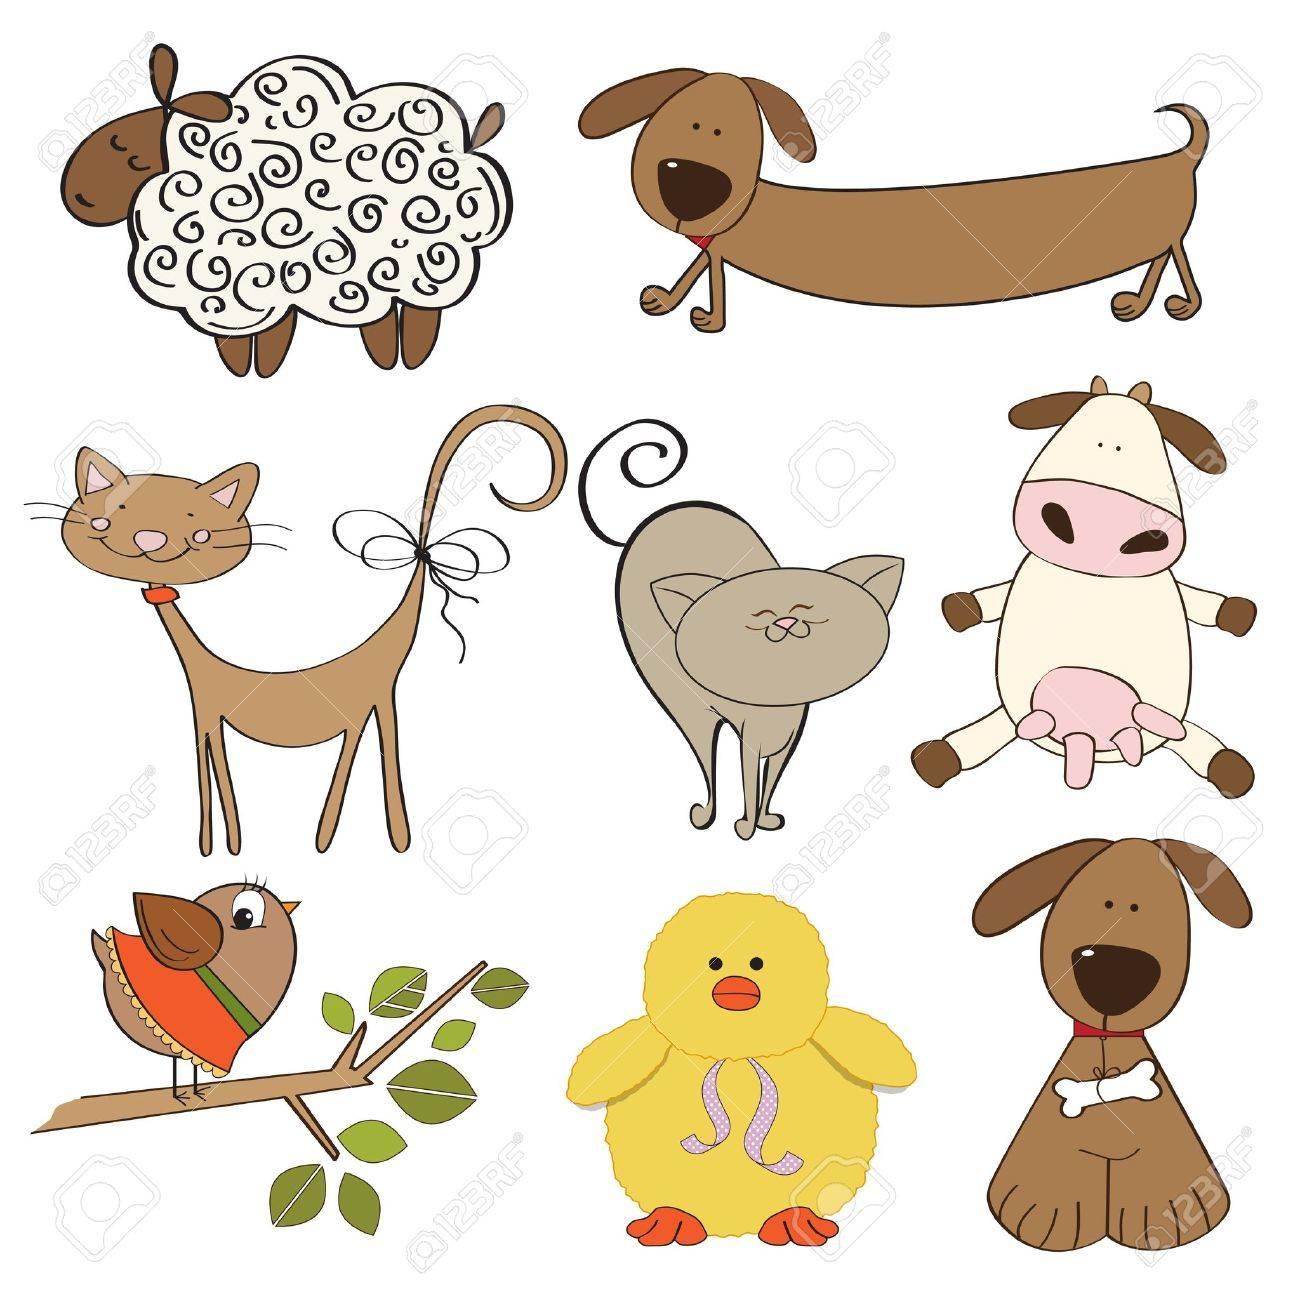 illustration of isolated farm animals set on white background Stock Vector - 13543047